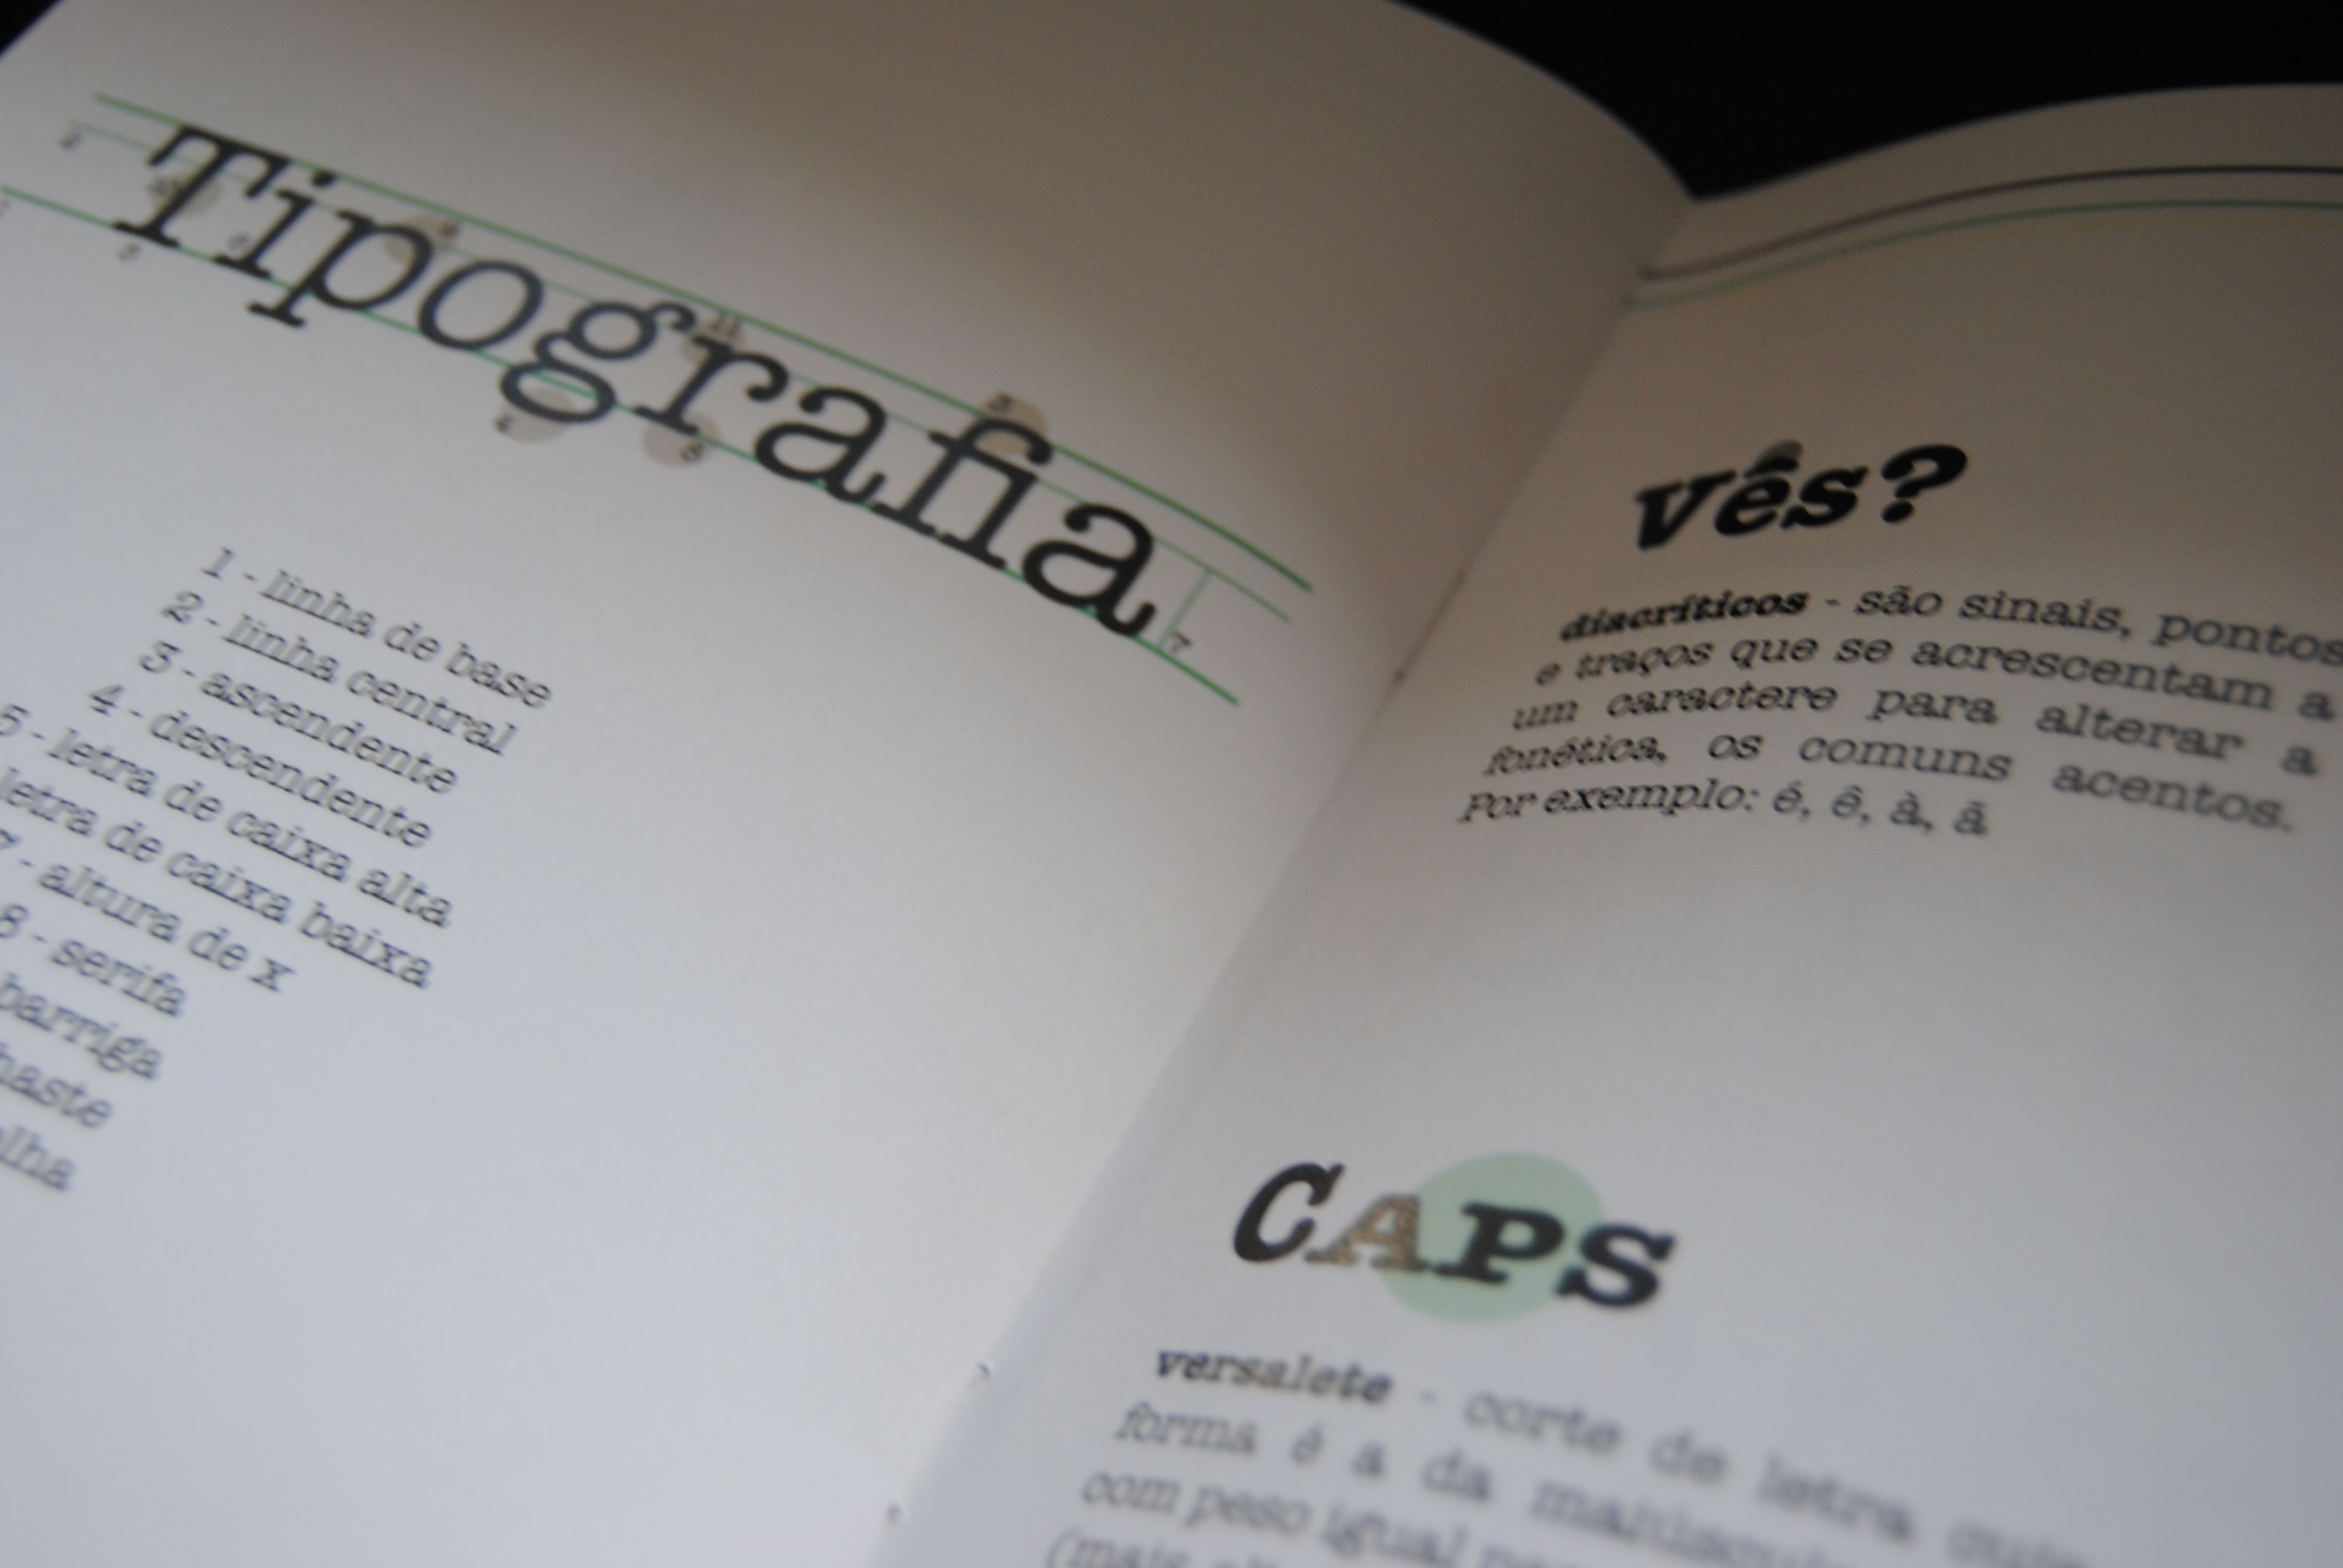 American Typewriter :: brochura demonstrativa da fonte